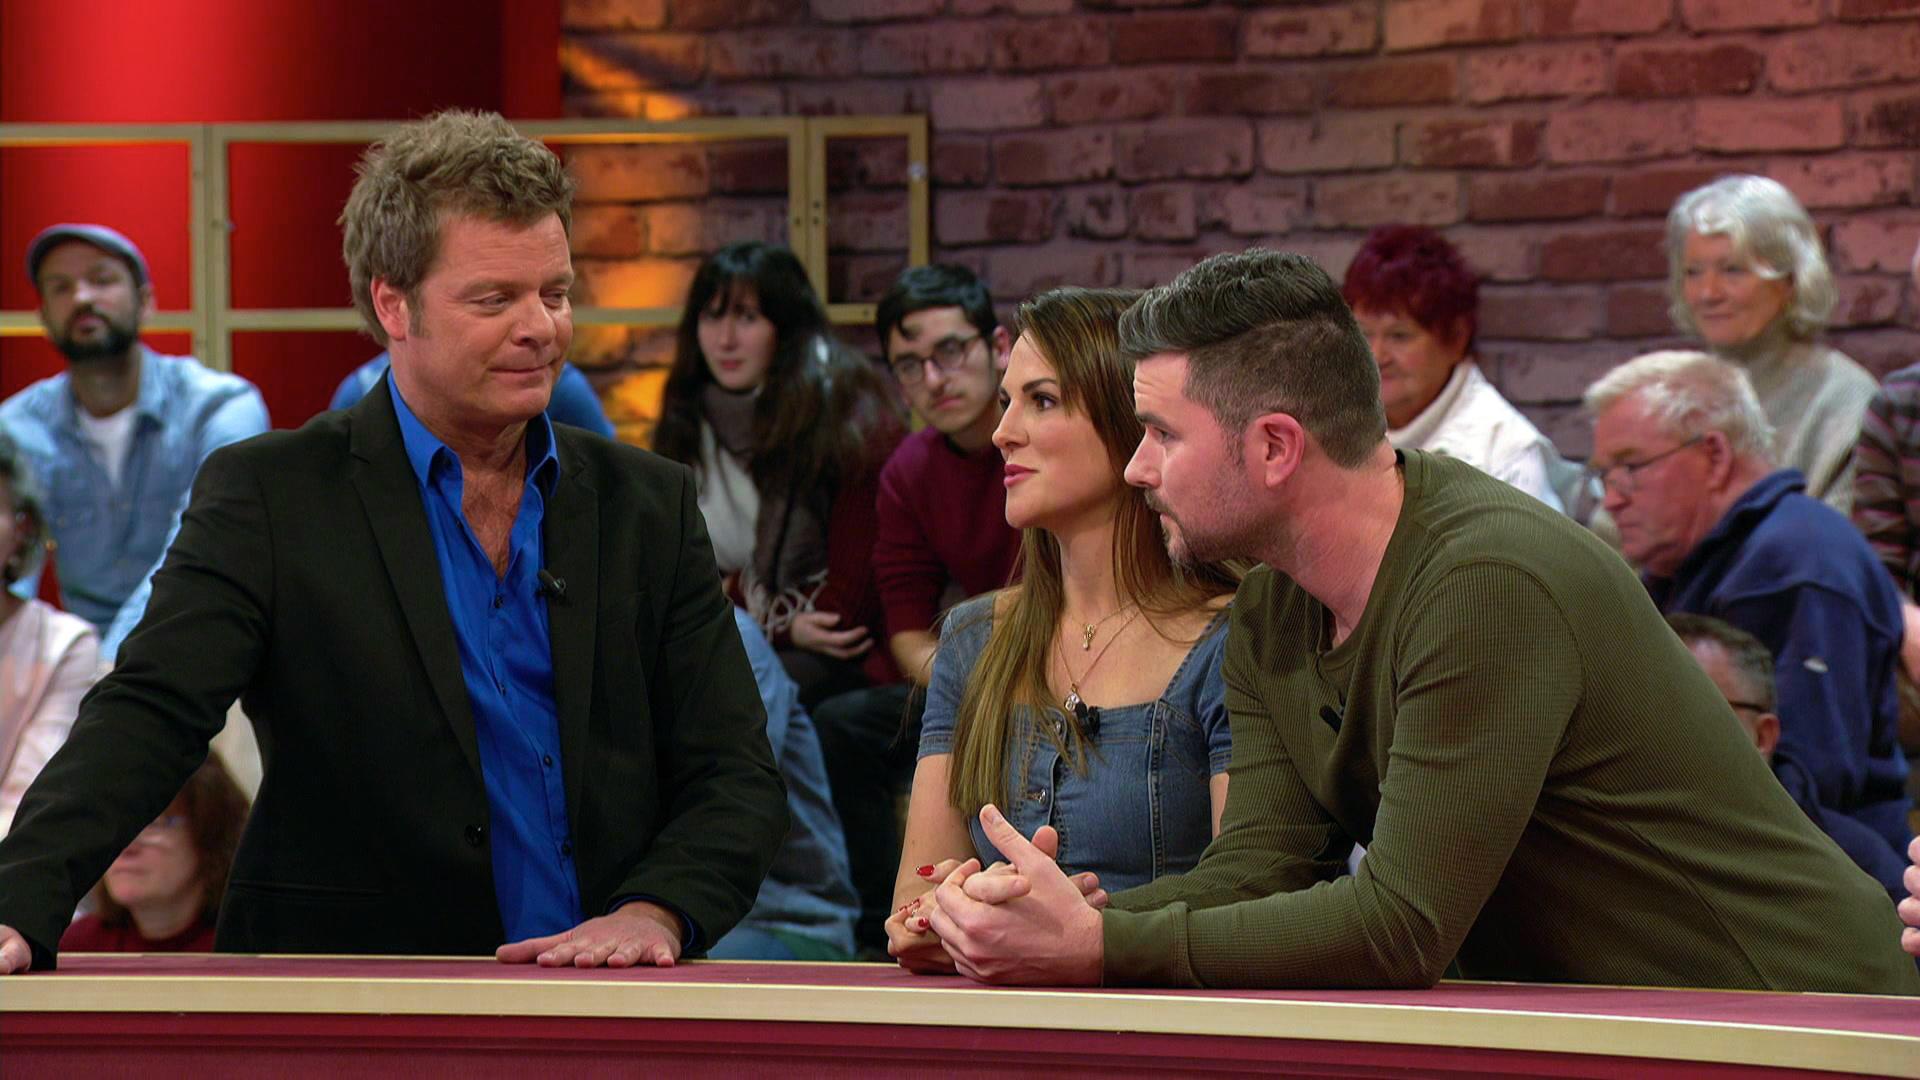 Kandidatenpaar Sarah & Kay / Experte Markus | Folge 36